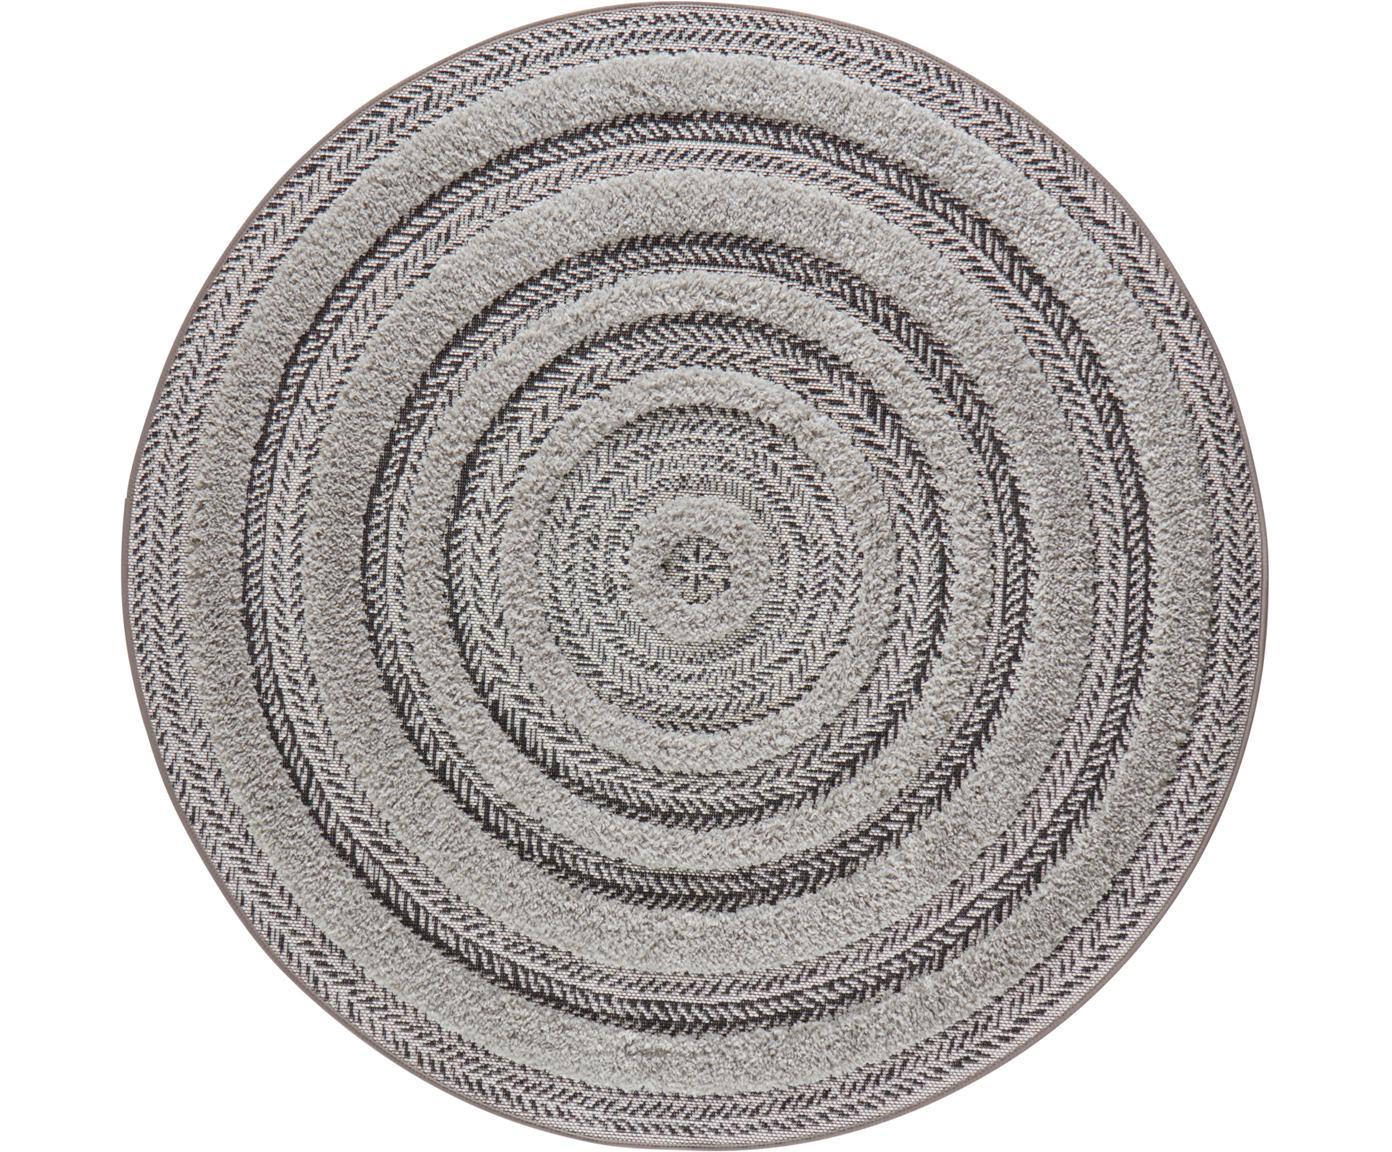 Alfombra redonda texturizada de interior/exterior Nador, Antracita, gris, Ø 160 cm (Tamaño L)